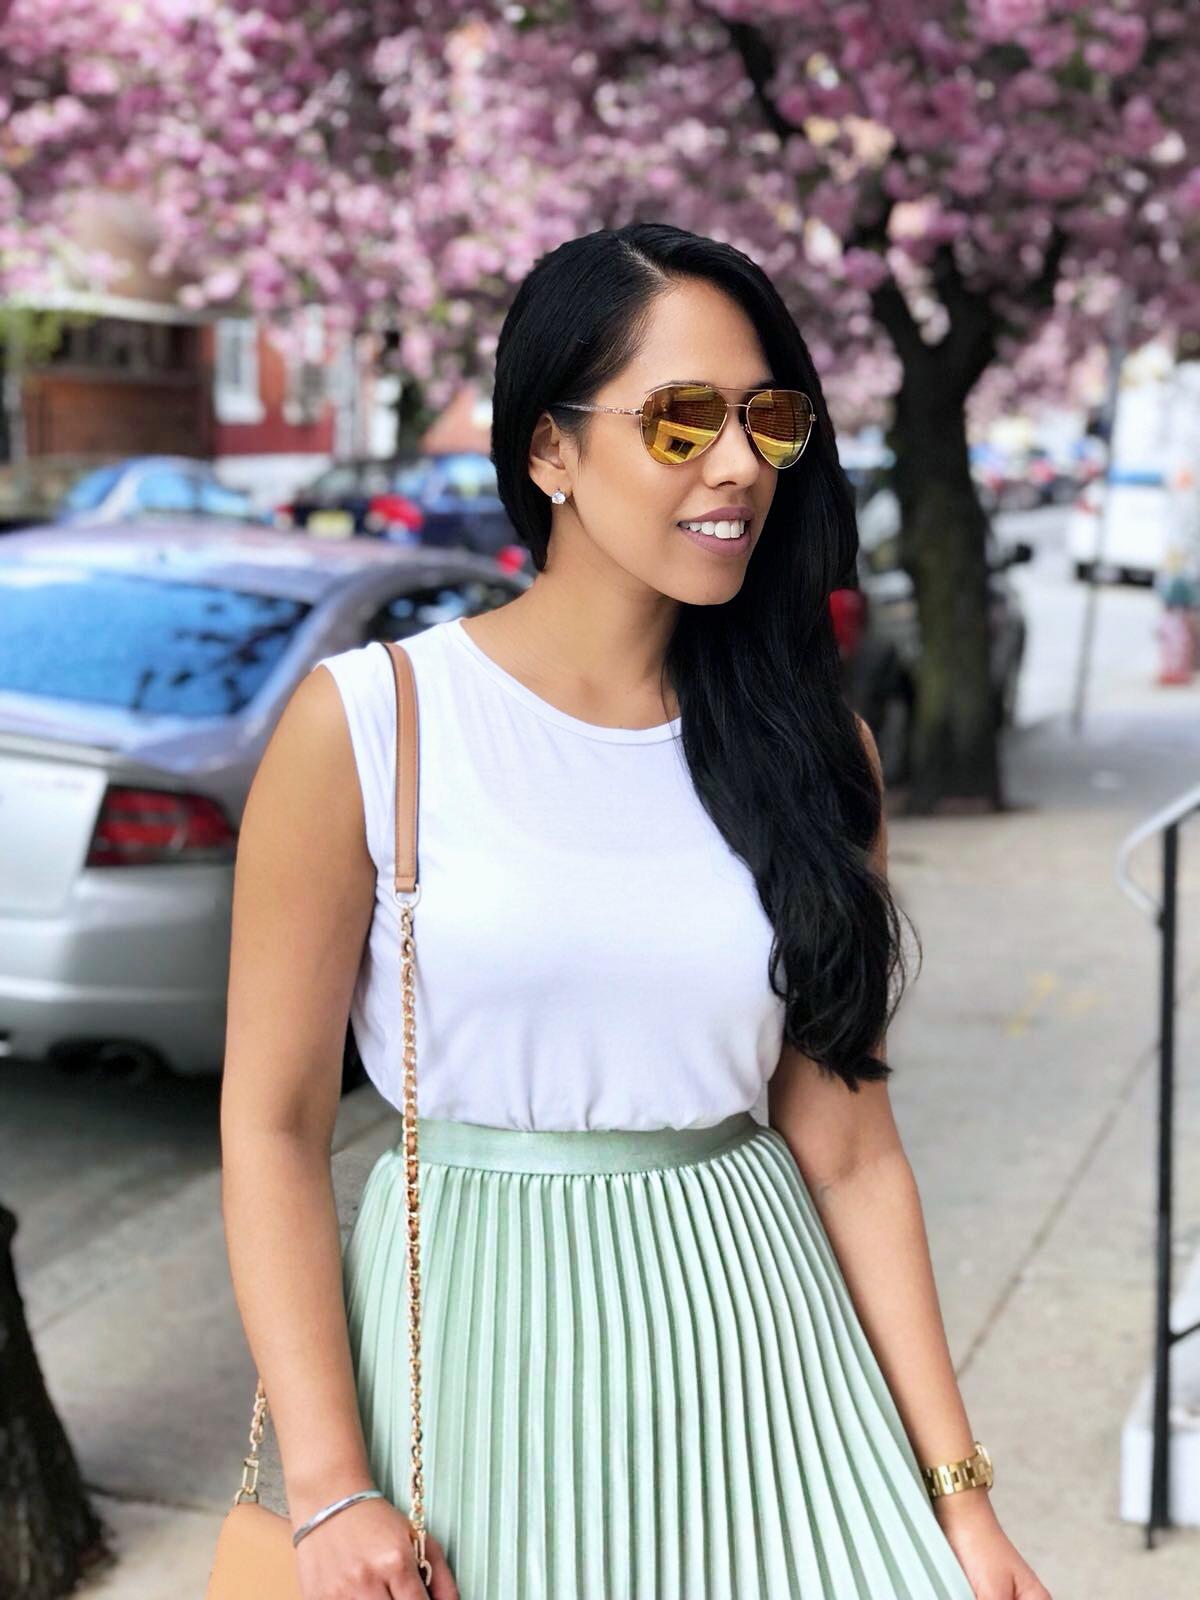 brunette-fashion-blogger-mygoldenbeauty.JPG